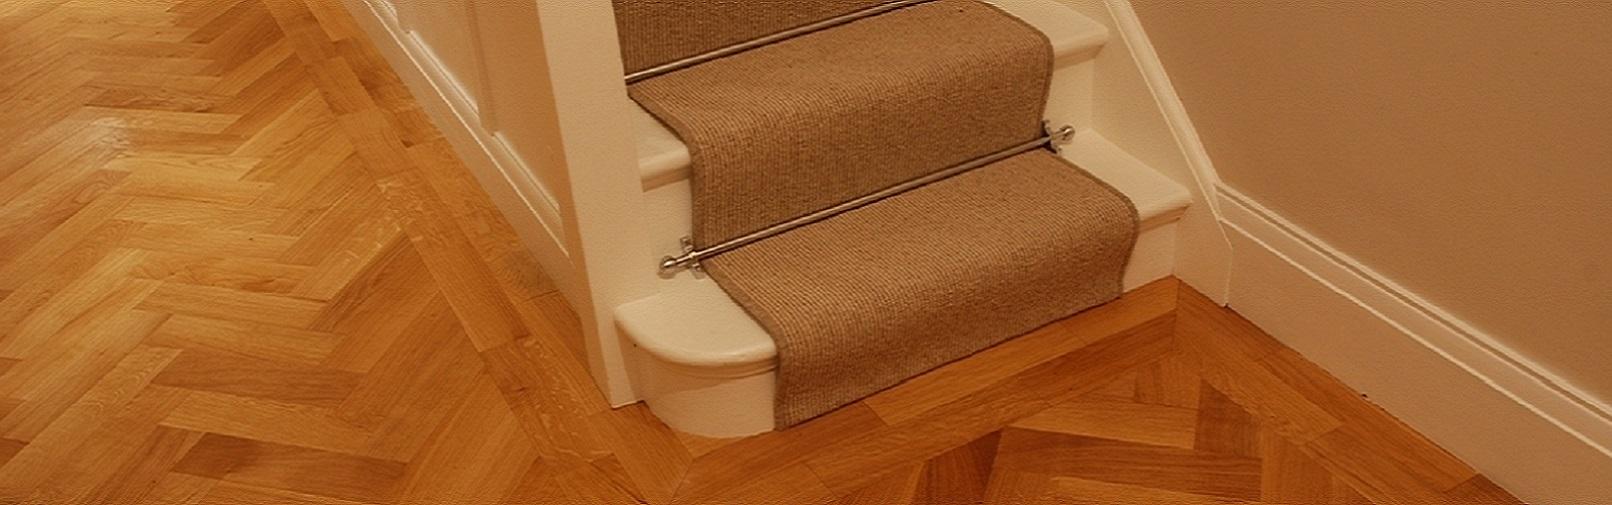 flooring image.jpg